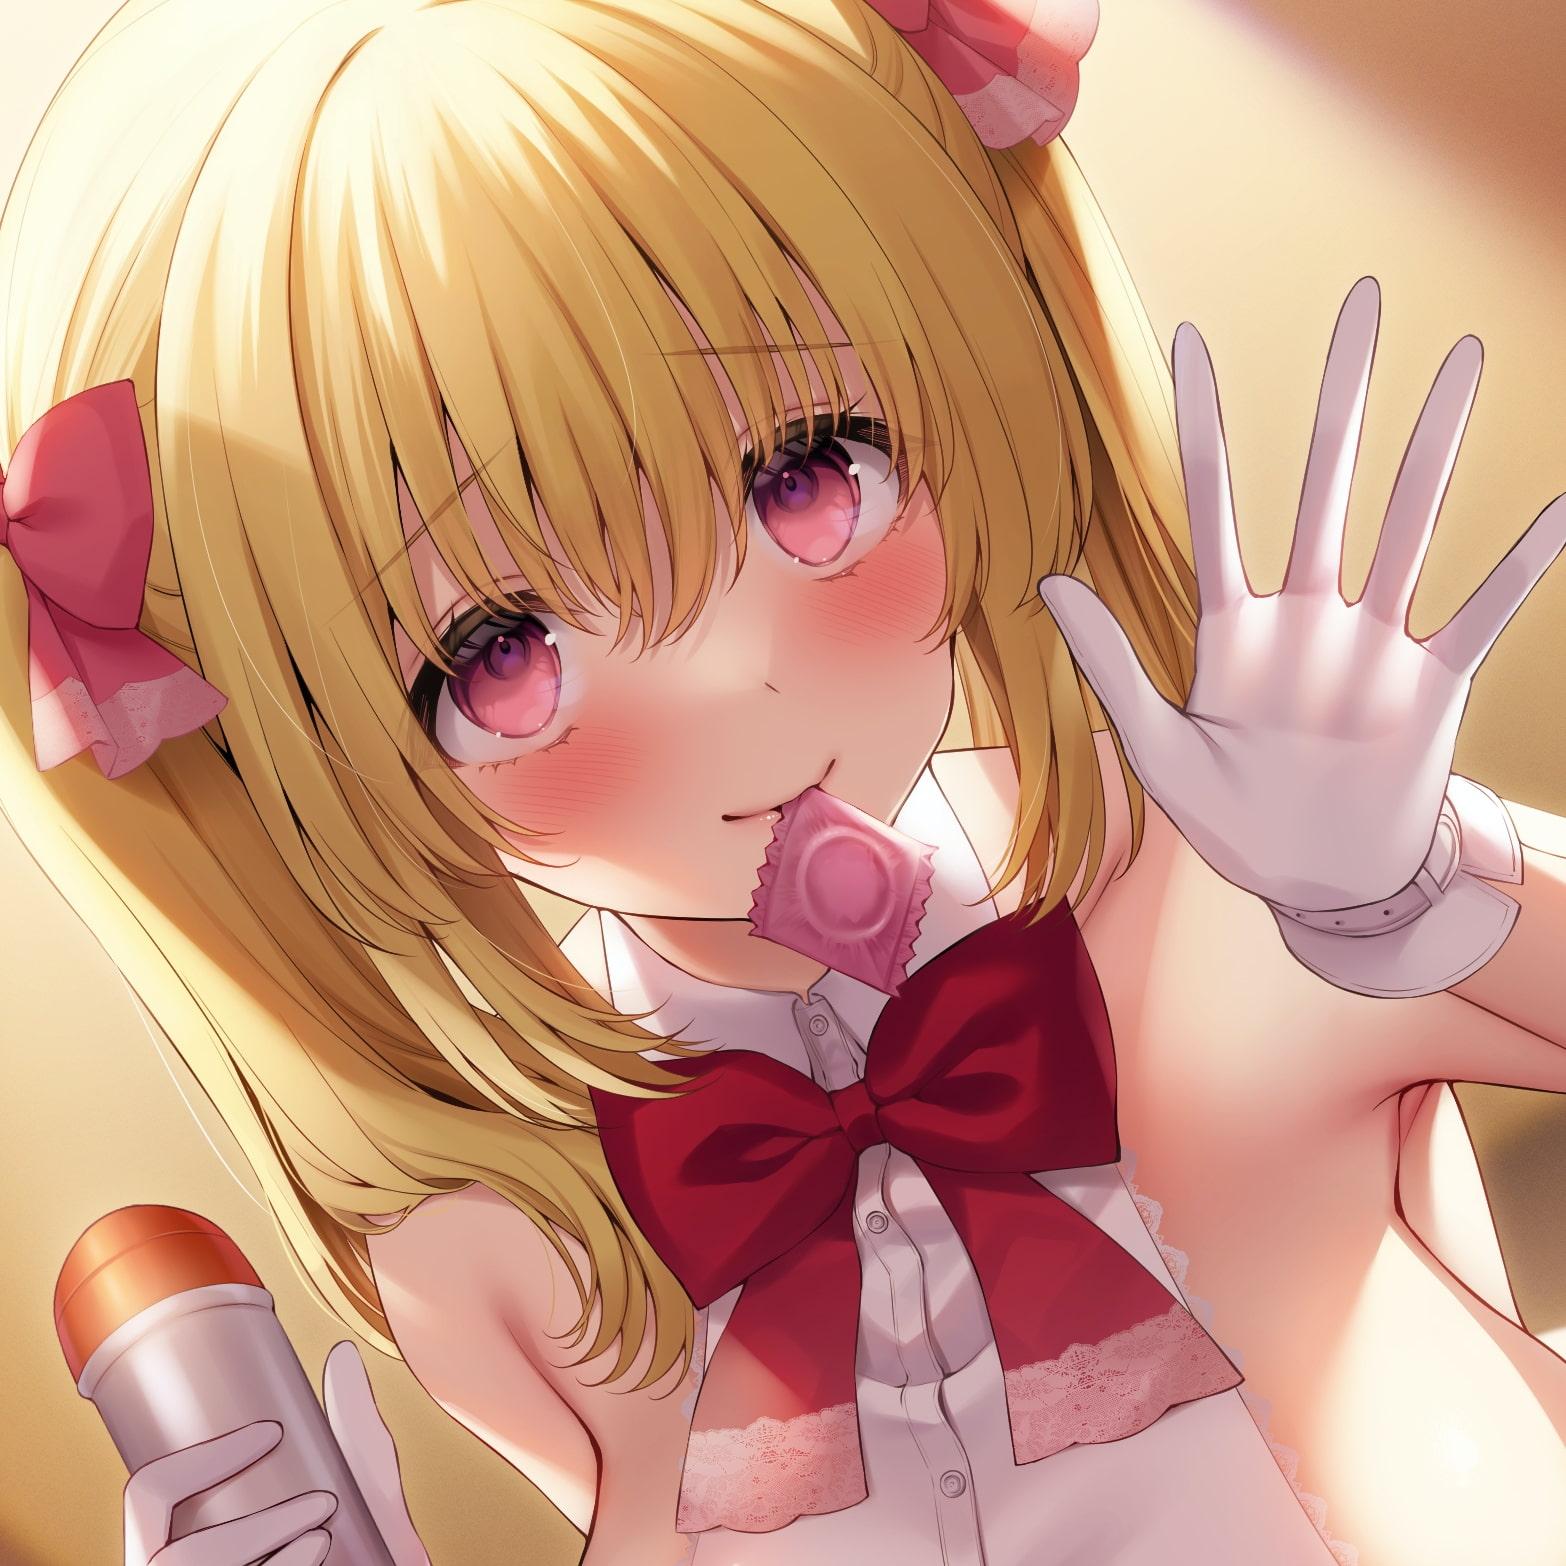 【KU100】ご奉仕デリヘル呼んだら推しアイドルが来て童貞卒業! ~そんなに私のこと好きだったら……挿れても、いいよ?~ [スタジオりふれぼ]